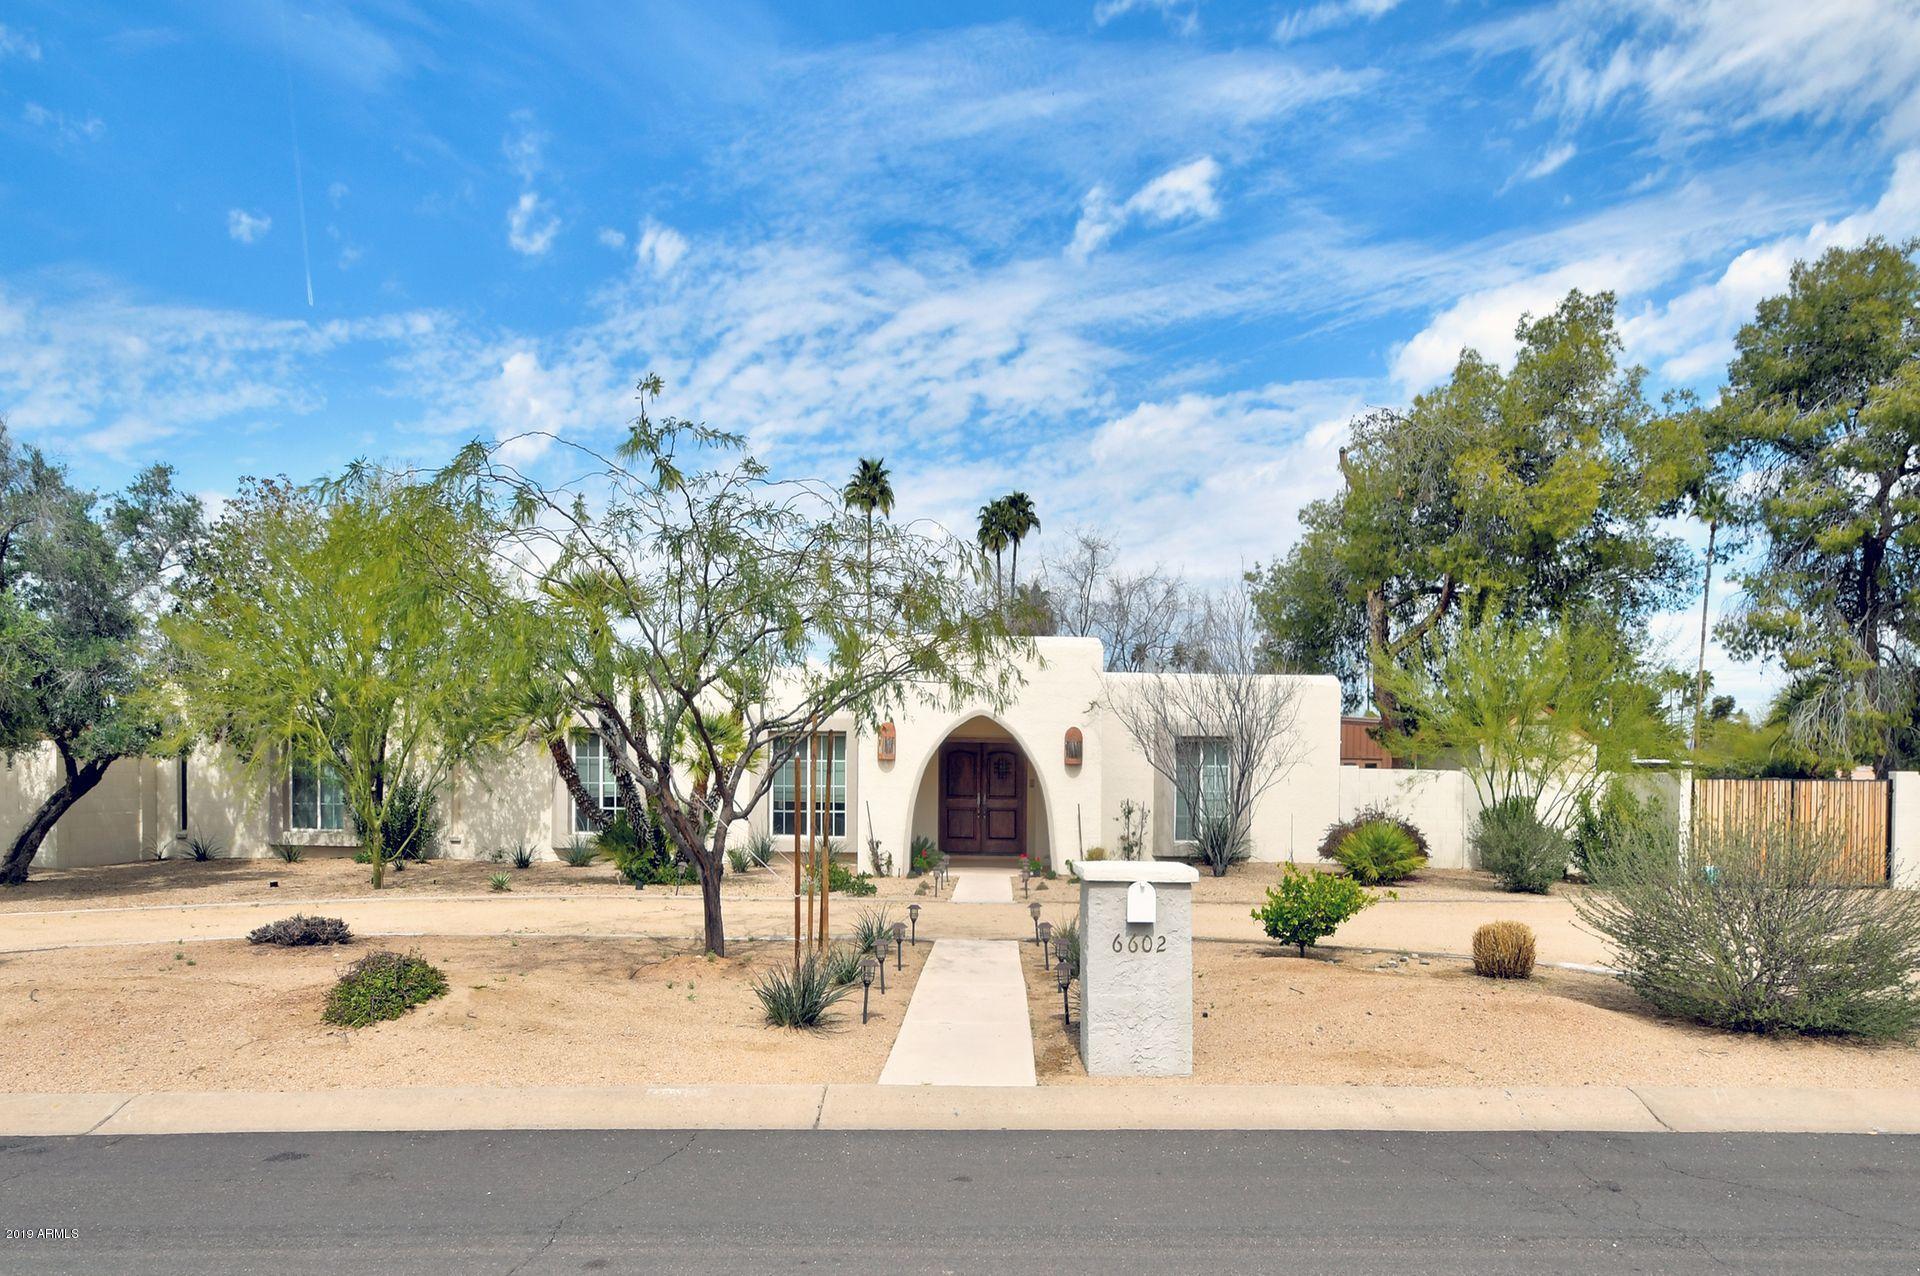 Photo of 6602 E NORTH Lane, Paradise Valley, AZ 85253